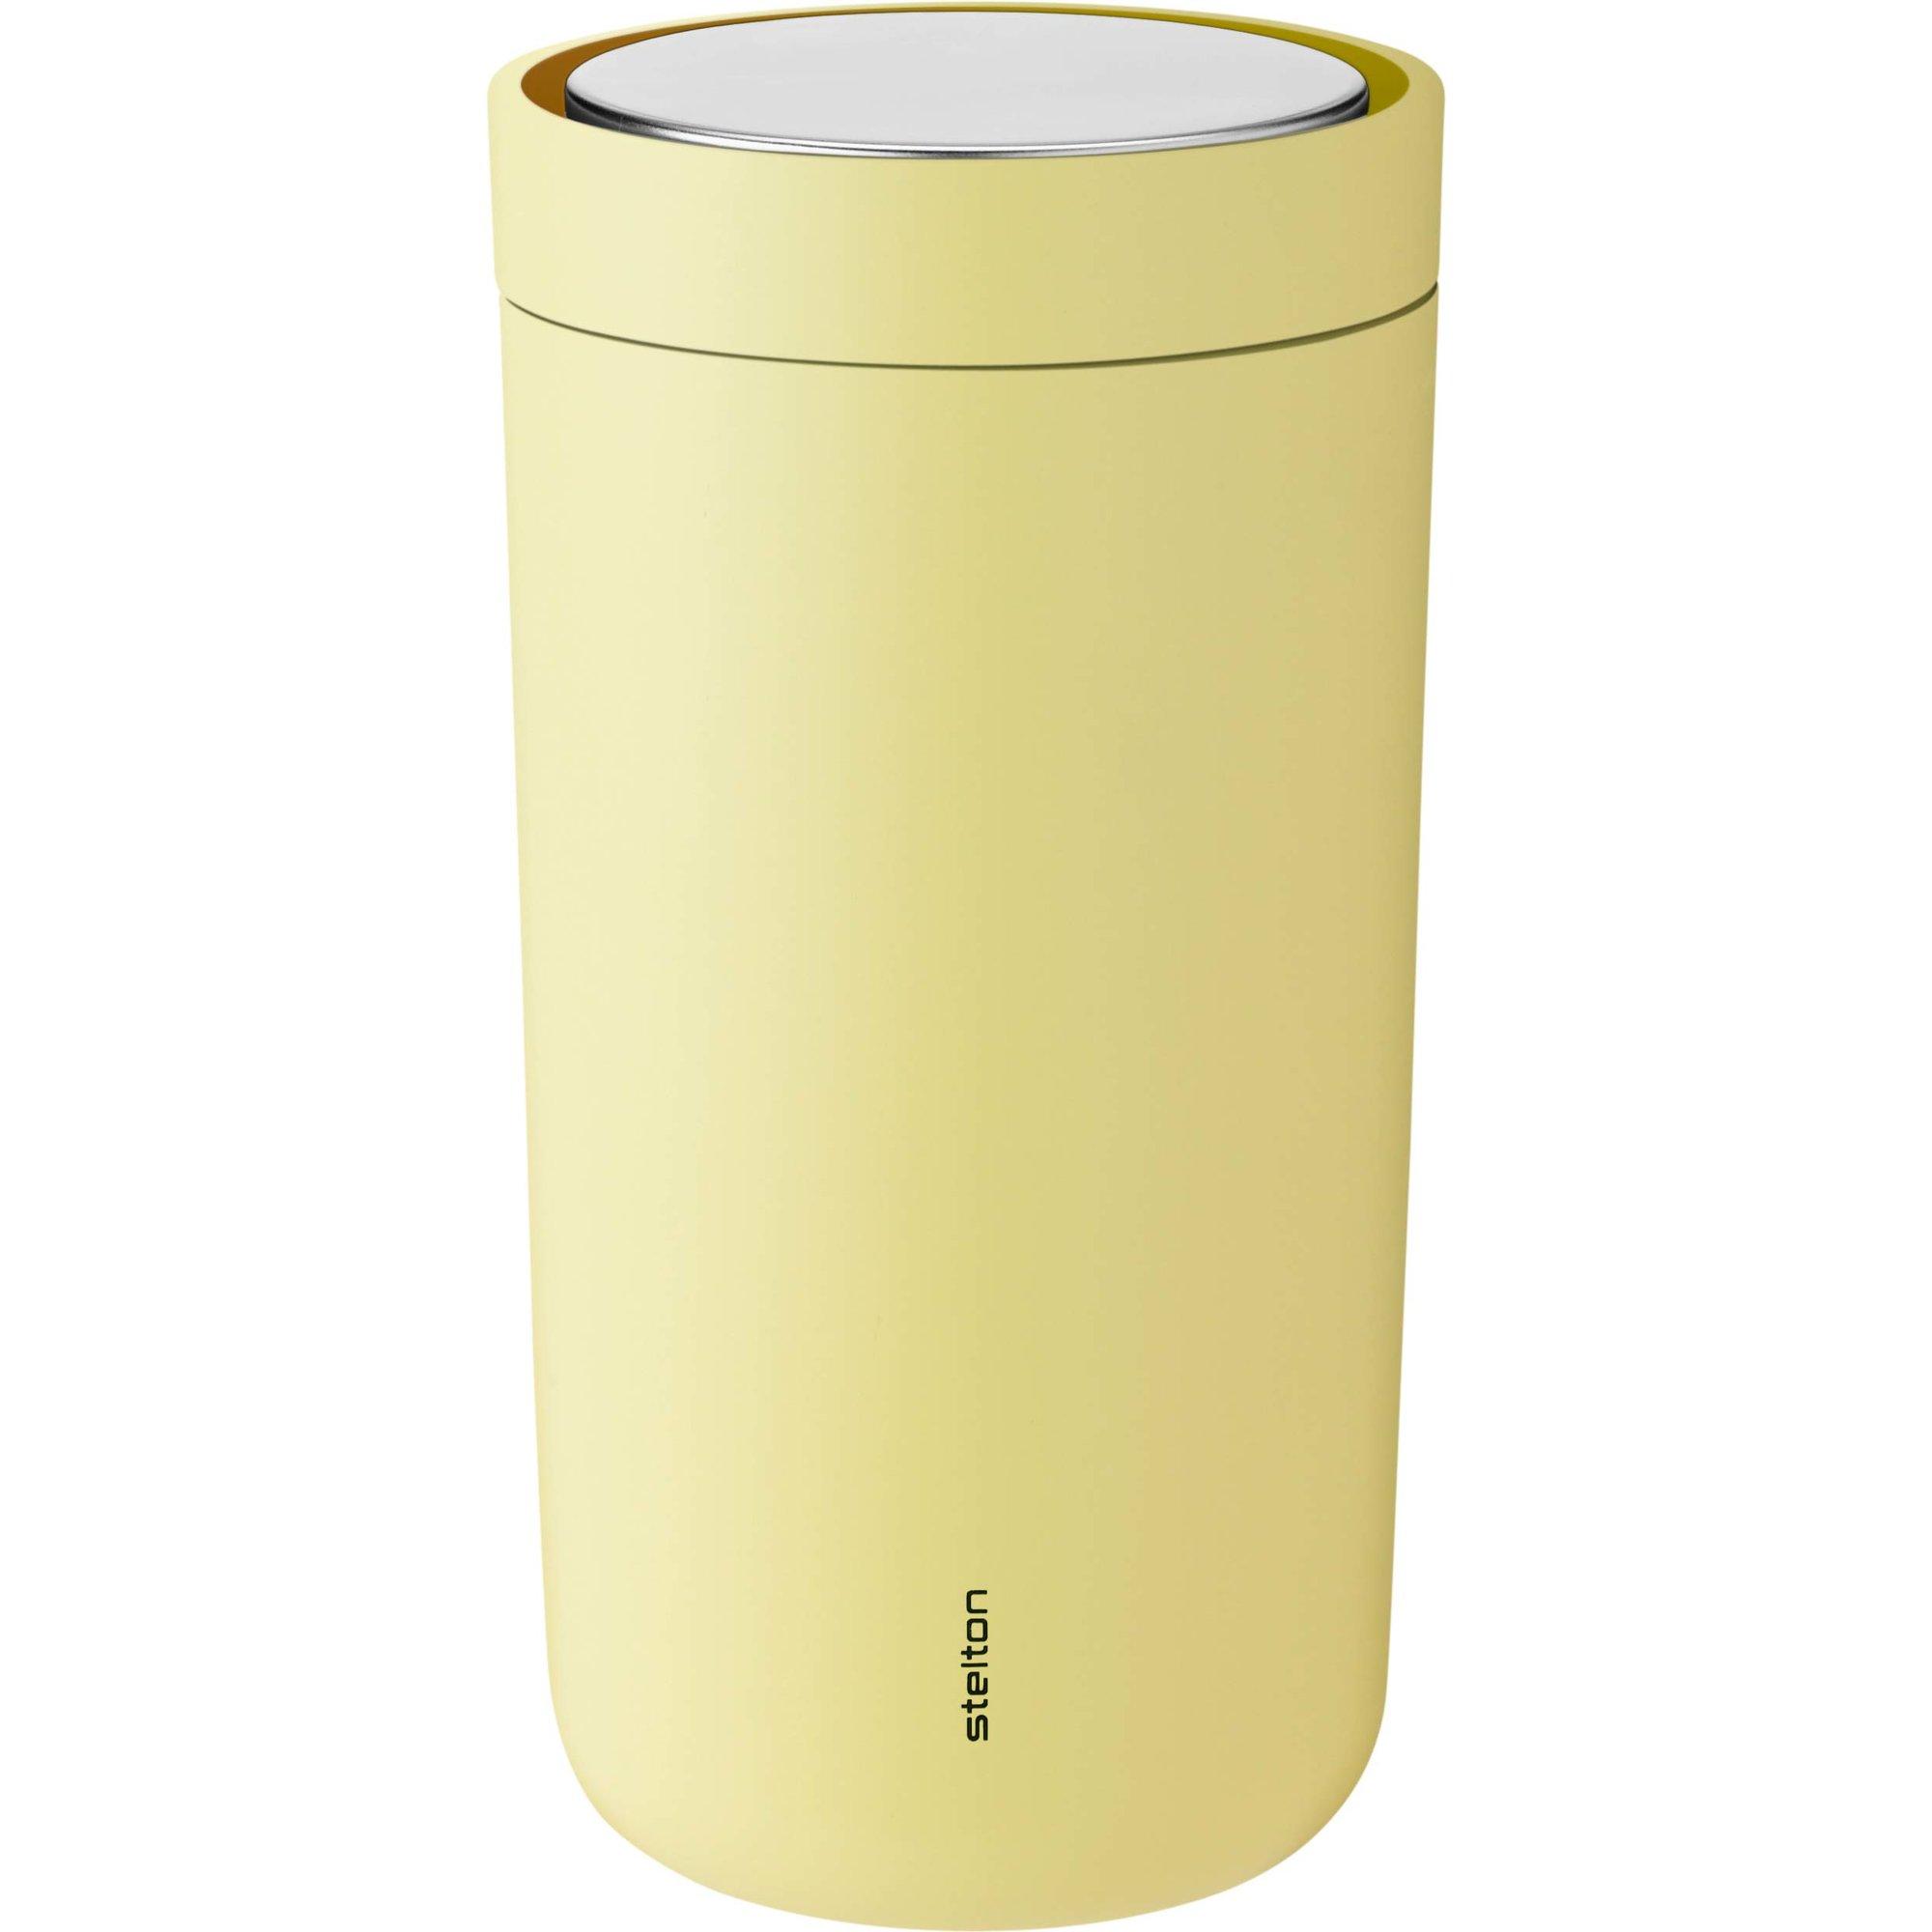 Stelton To Go Click termoskopp 02 liter gul